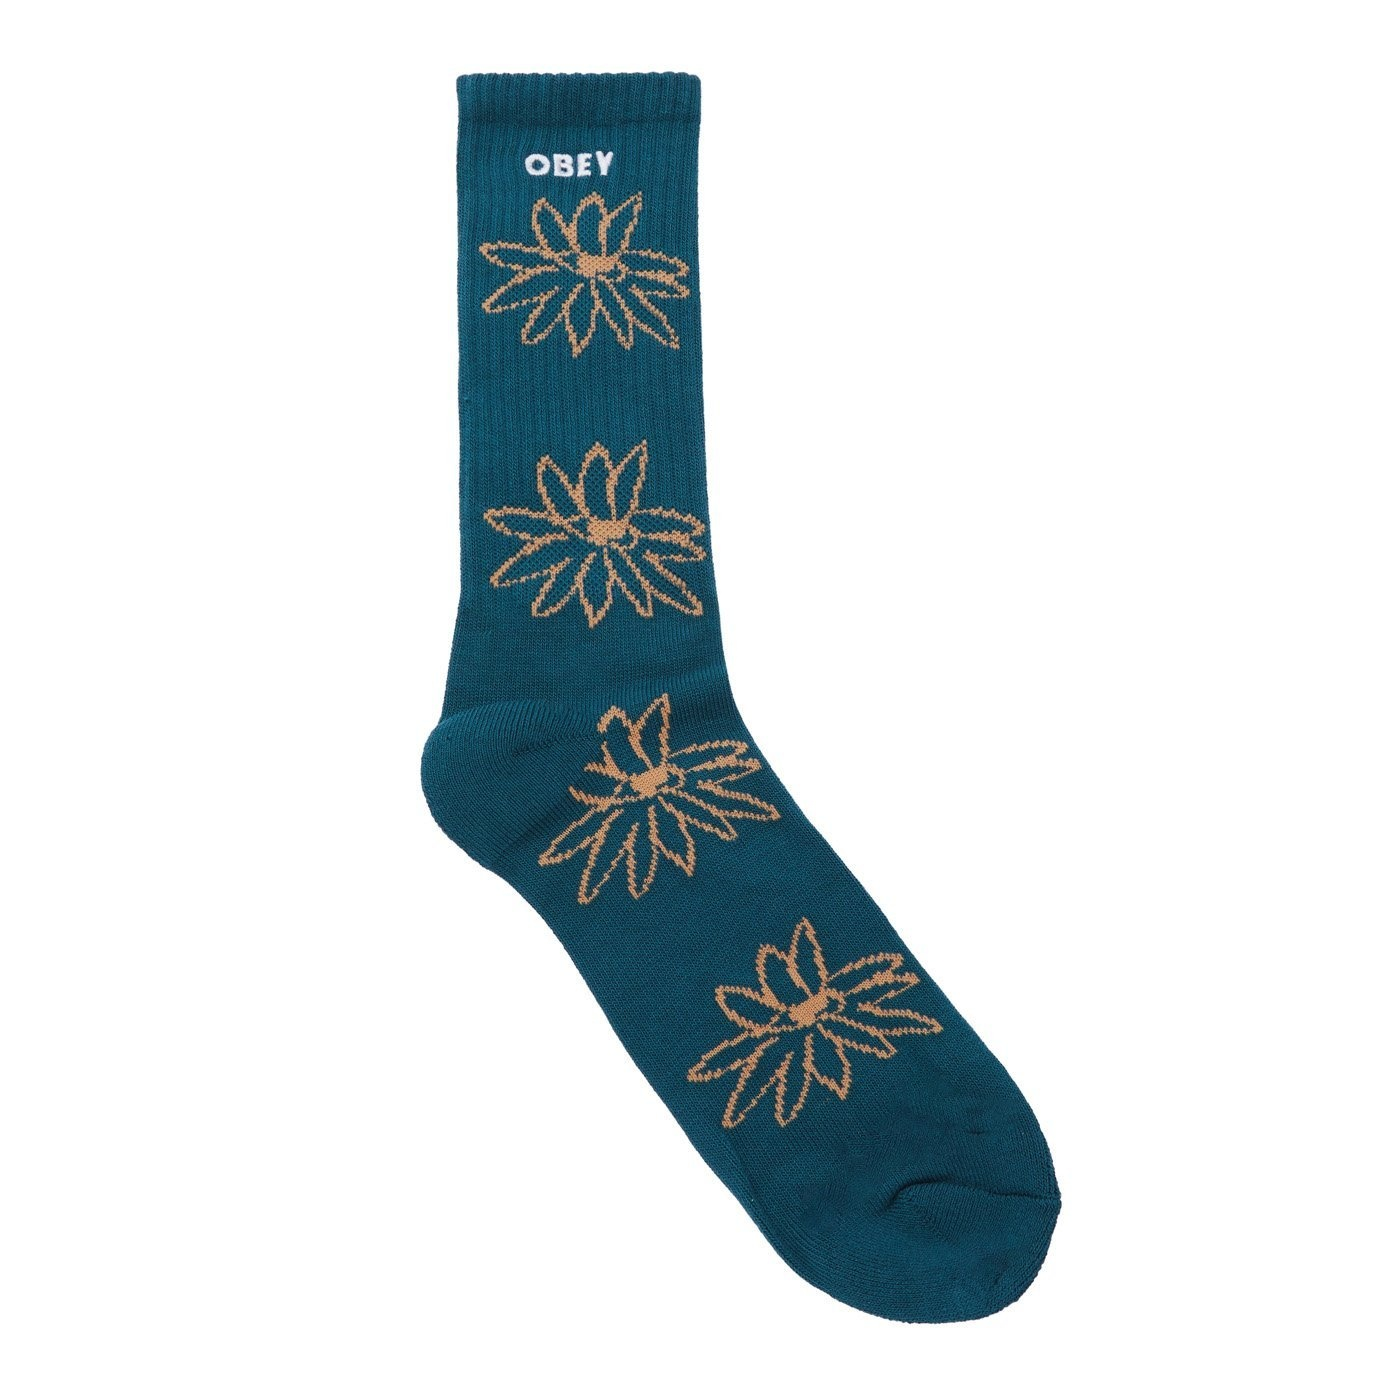 Obey Obey - Natty Socks (Deep Ocean)